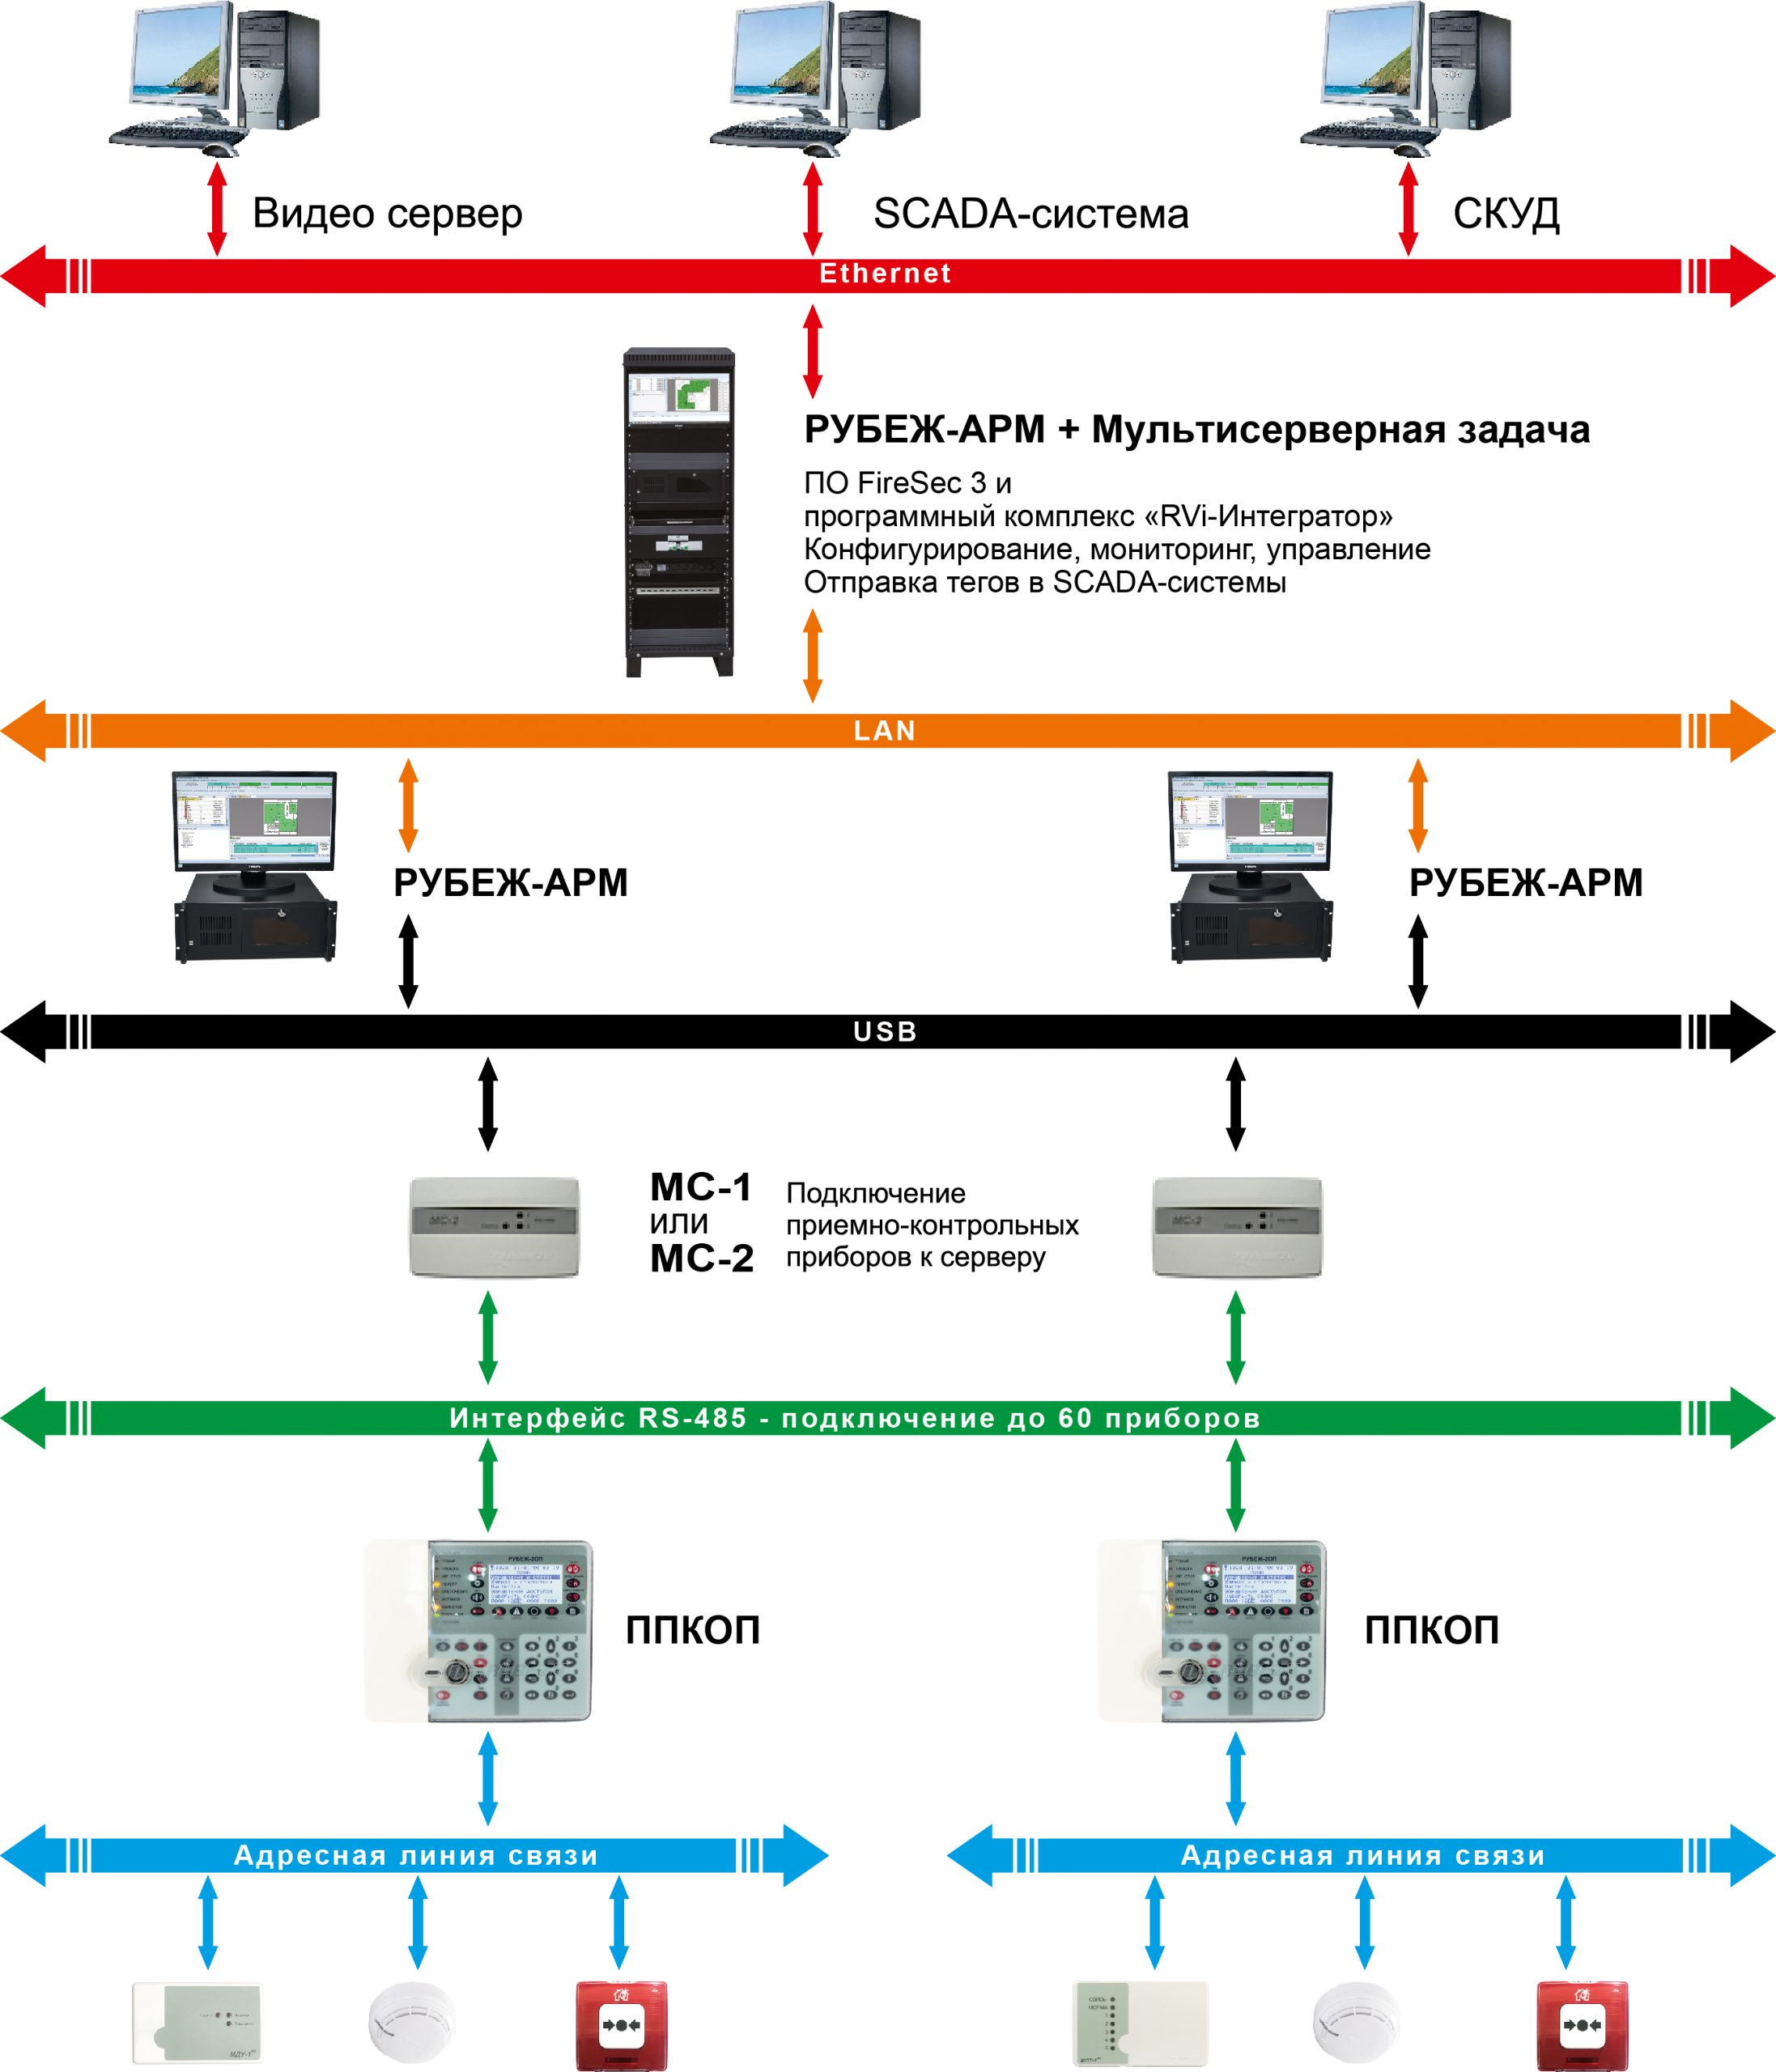 ЦПИУ РУБЕЖ-АРМ ИСП. 2 (НАСТОЛЬНЫЙ) ПРОТ. R3